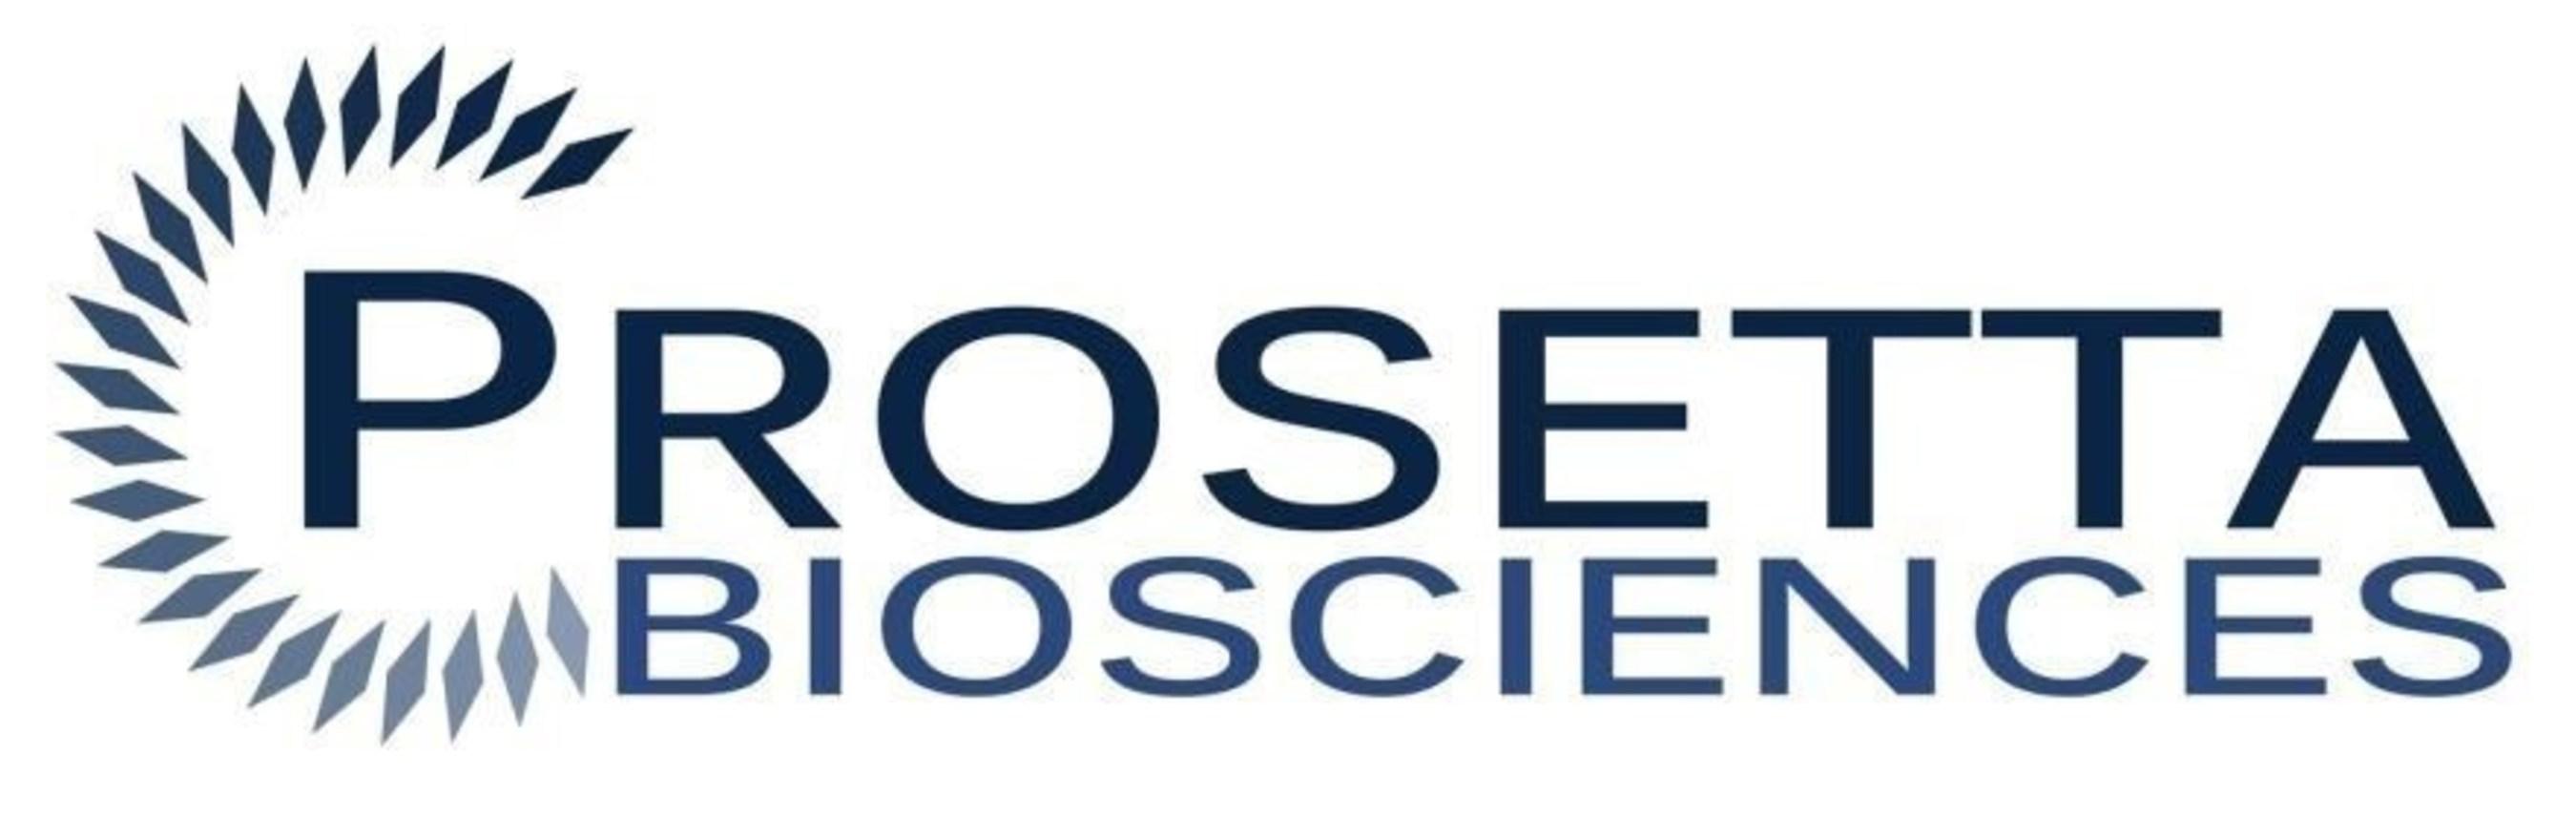 Prosetta Biosciences, Inc. Logo